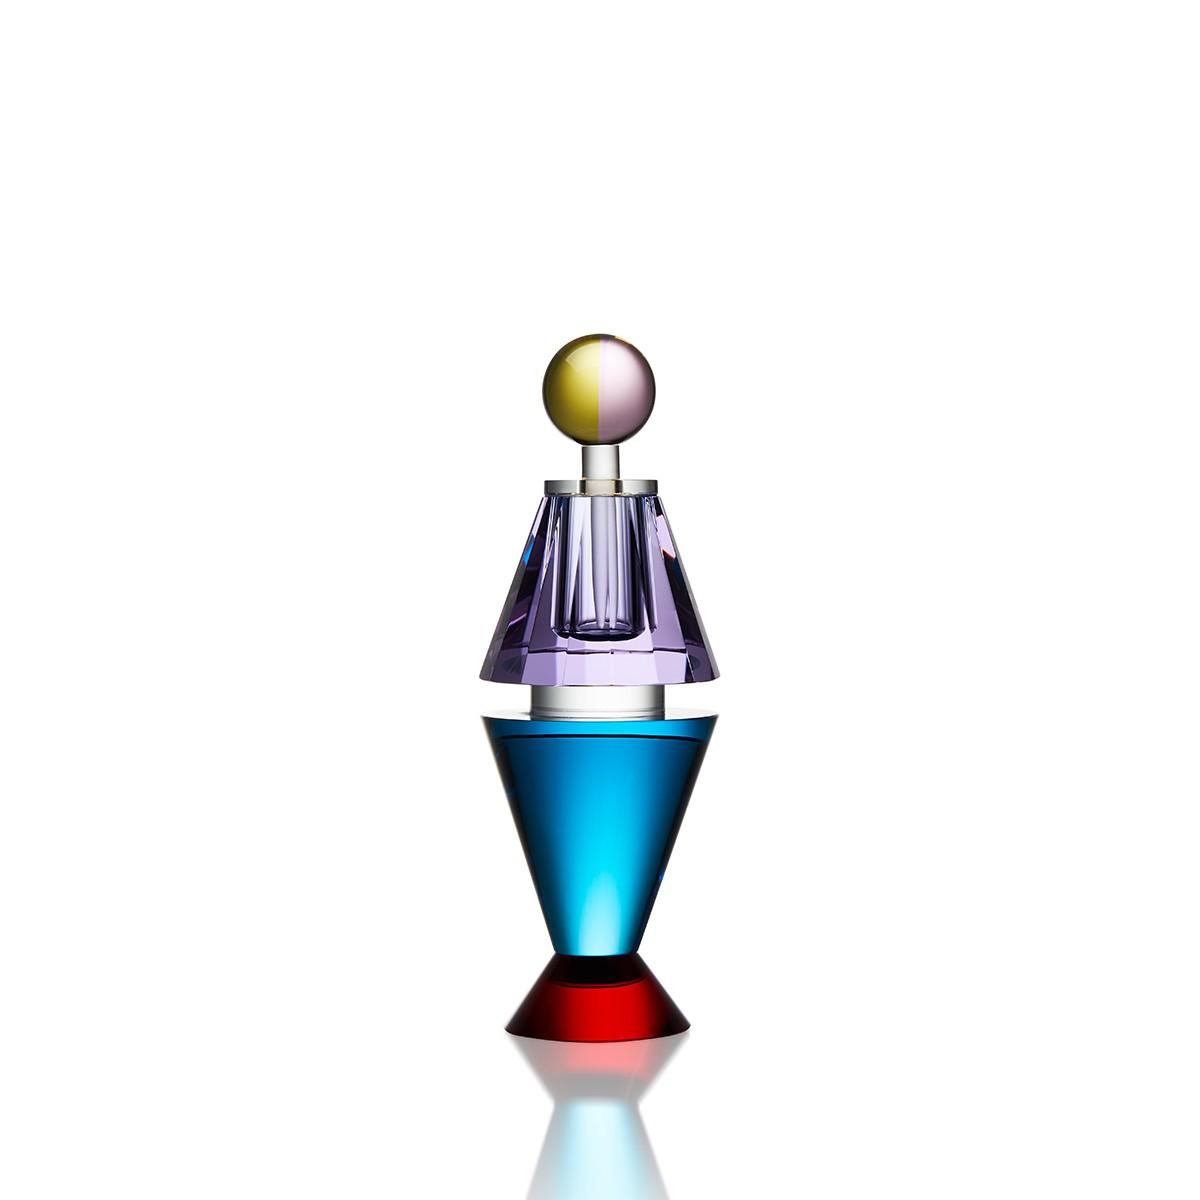 Reflections Copenhagen I Lauderdale Perfume Flacon